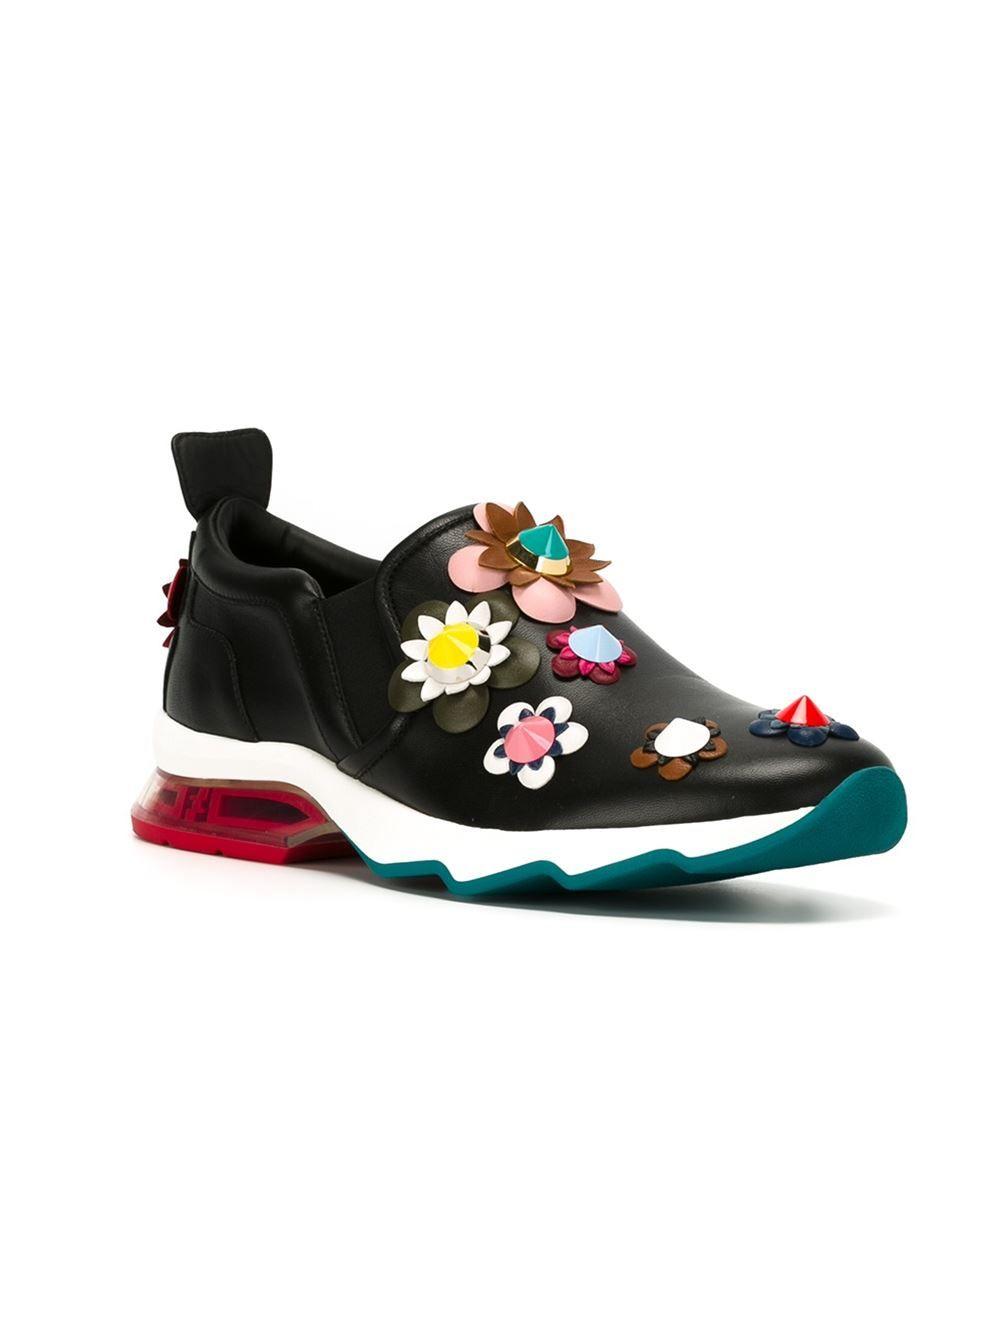 421e2bb2ab fendi  sneakers  flowers  aplique  woman  fashion www.jofre.eu ...